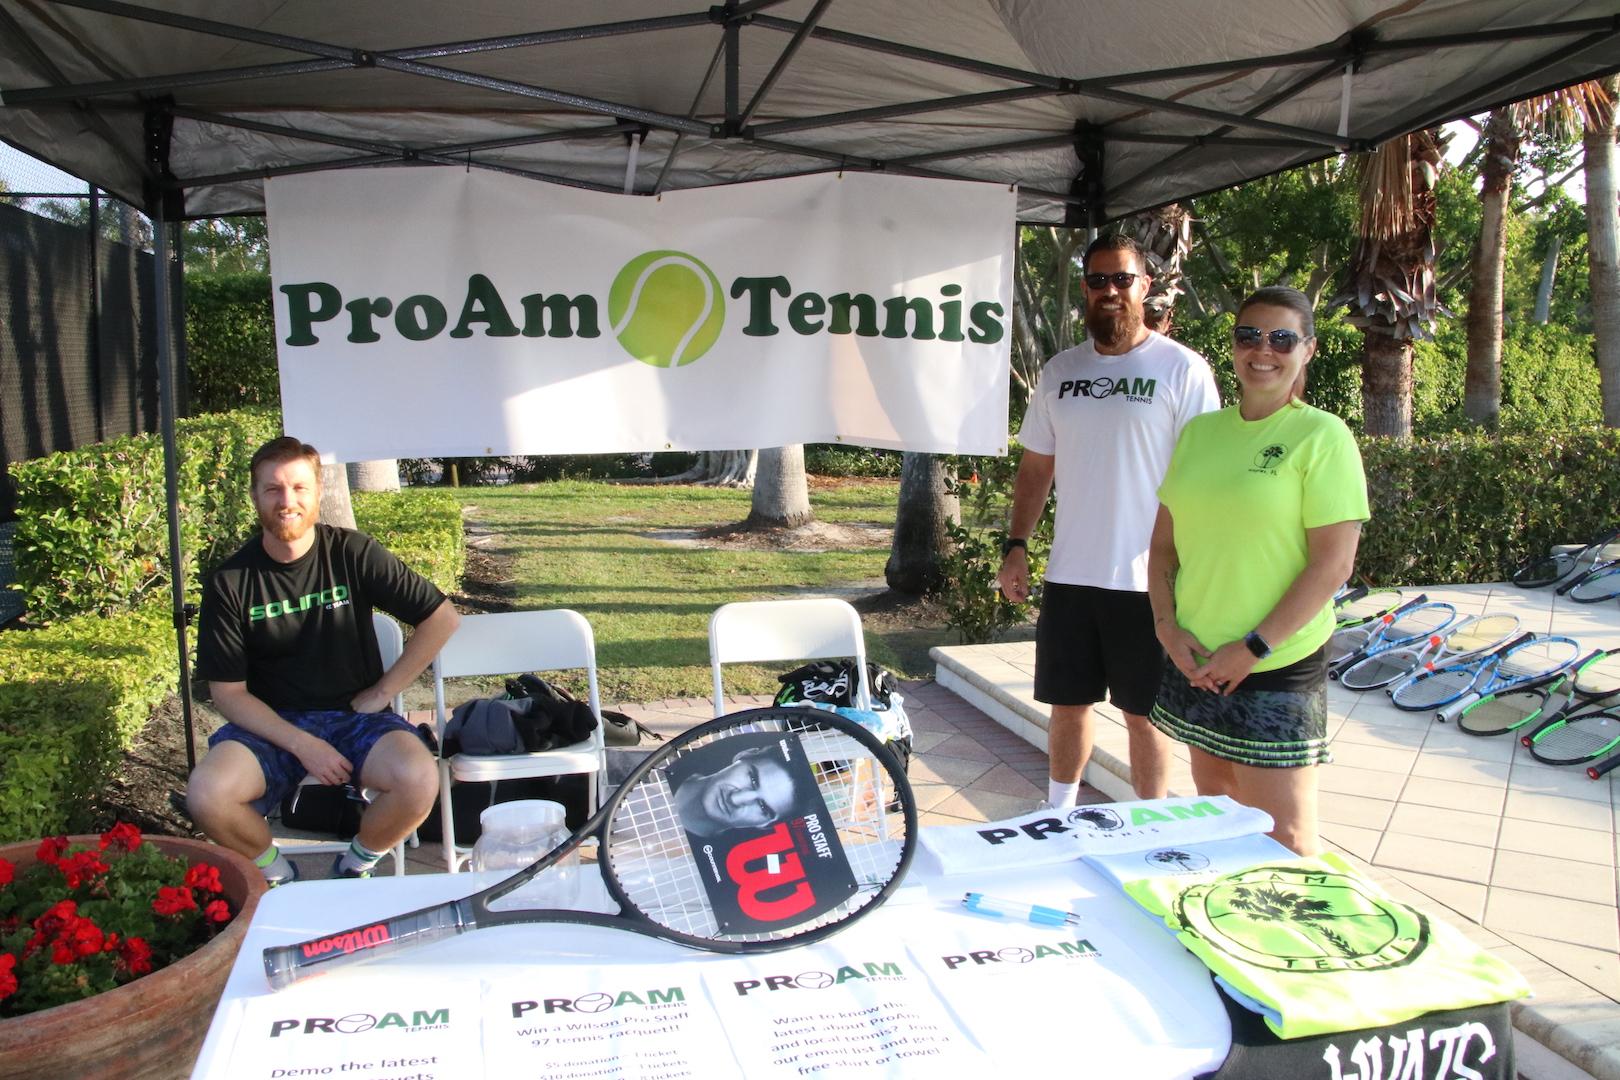 tennis-proam.JPG